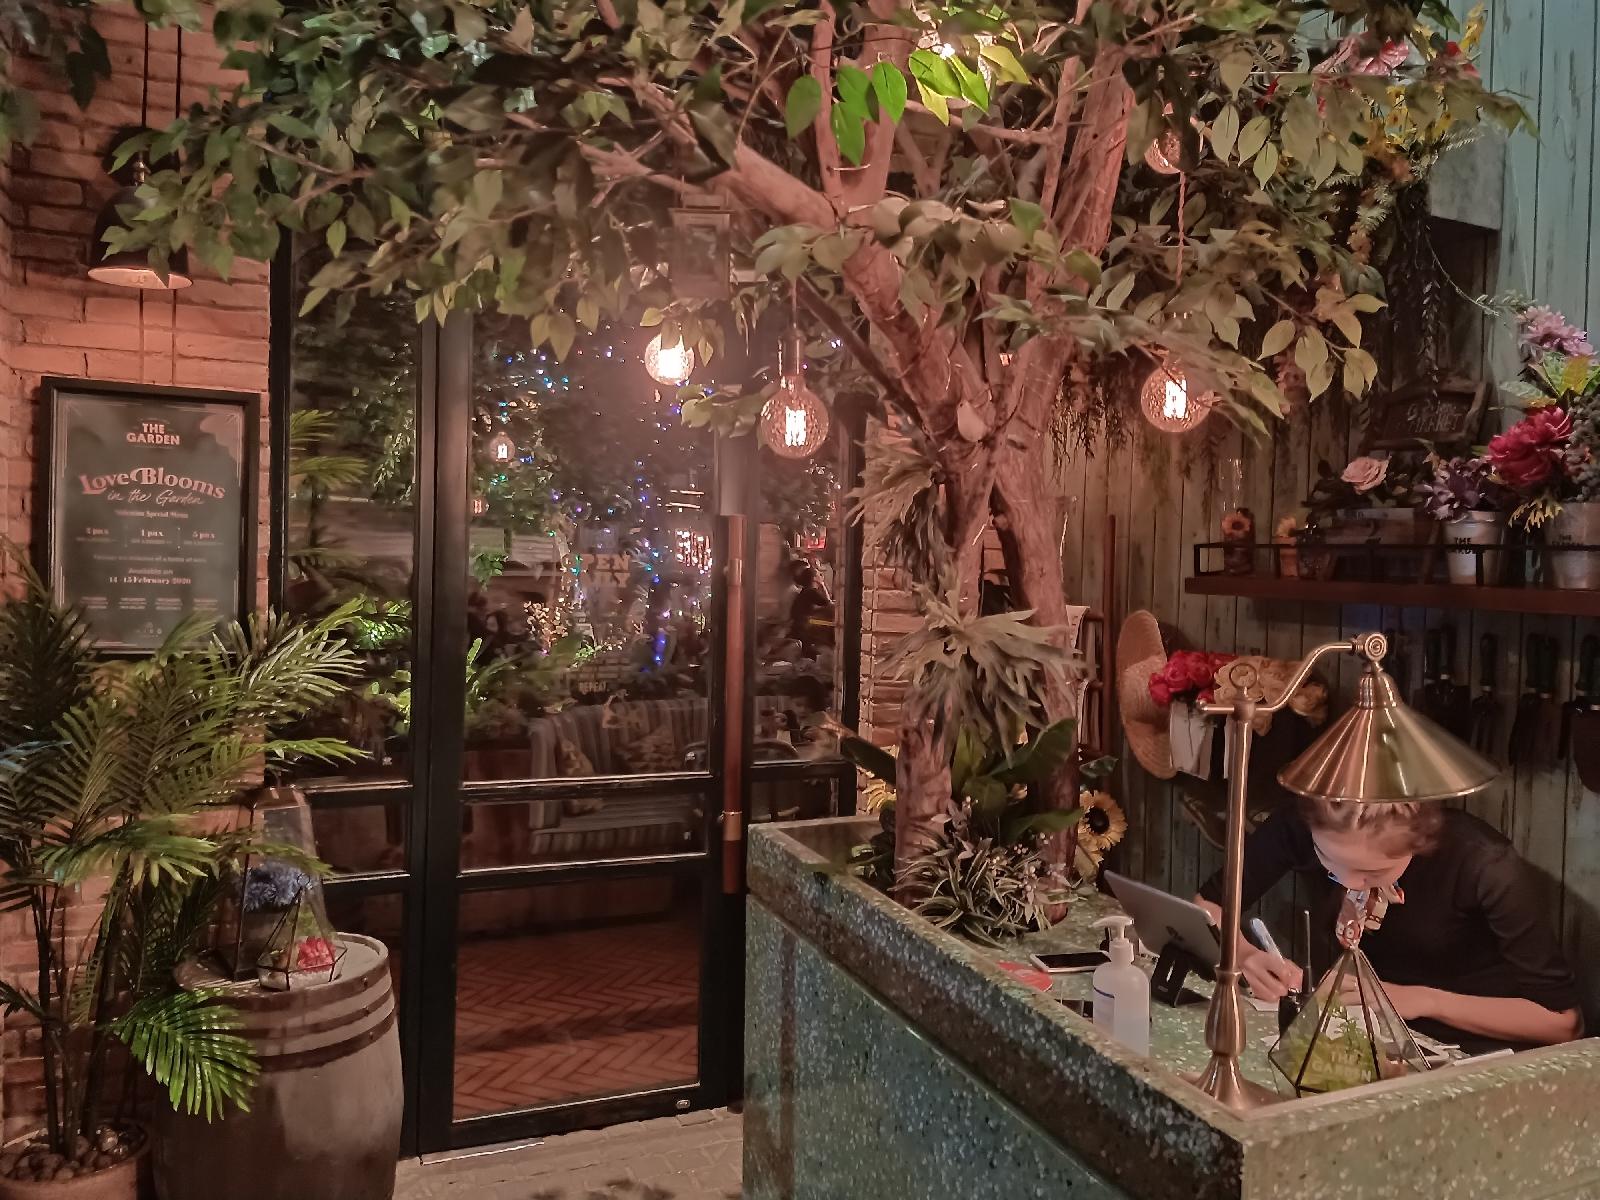 Tempat Makan Nuansa Bunga The Garden Pik Jakarta Utara Newauke Com